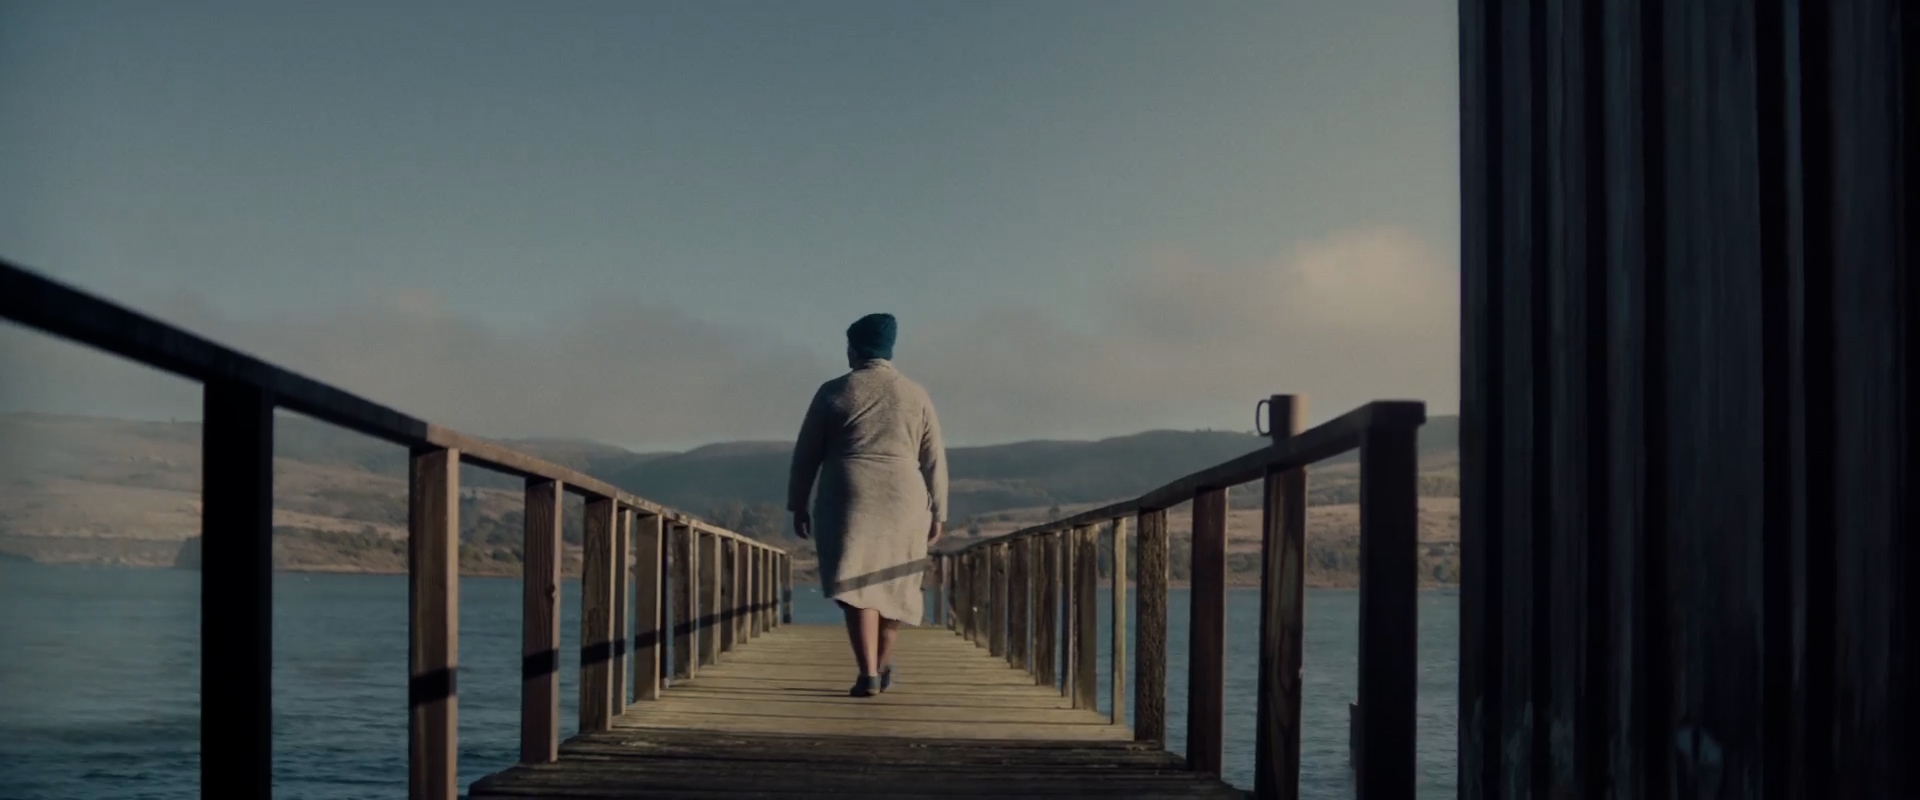 scene pier water clothing fog sky person railing lake cloud man footwear overlooking distance